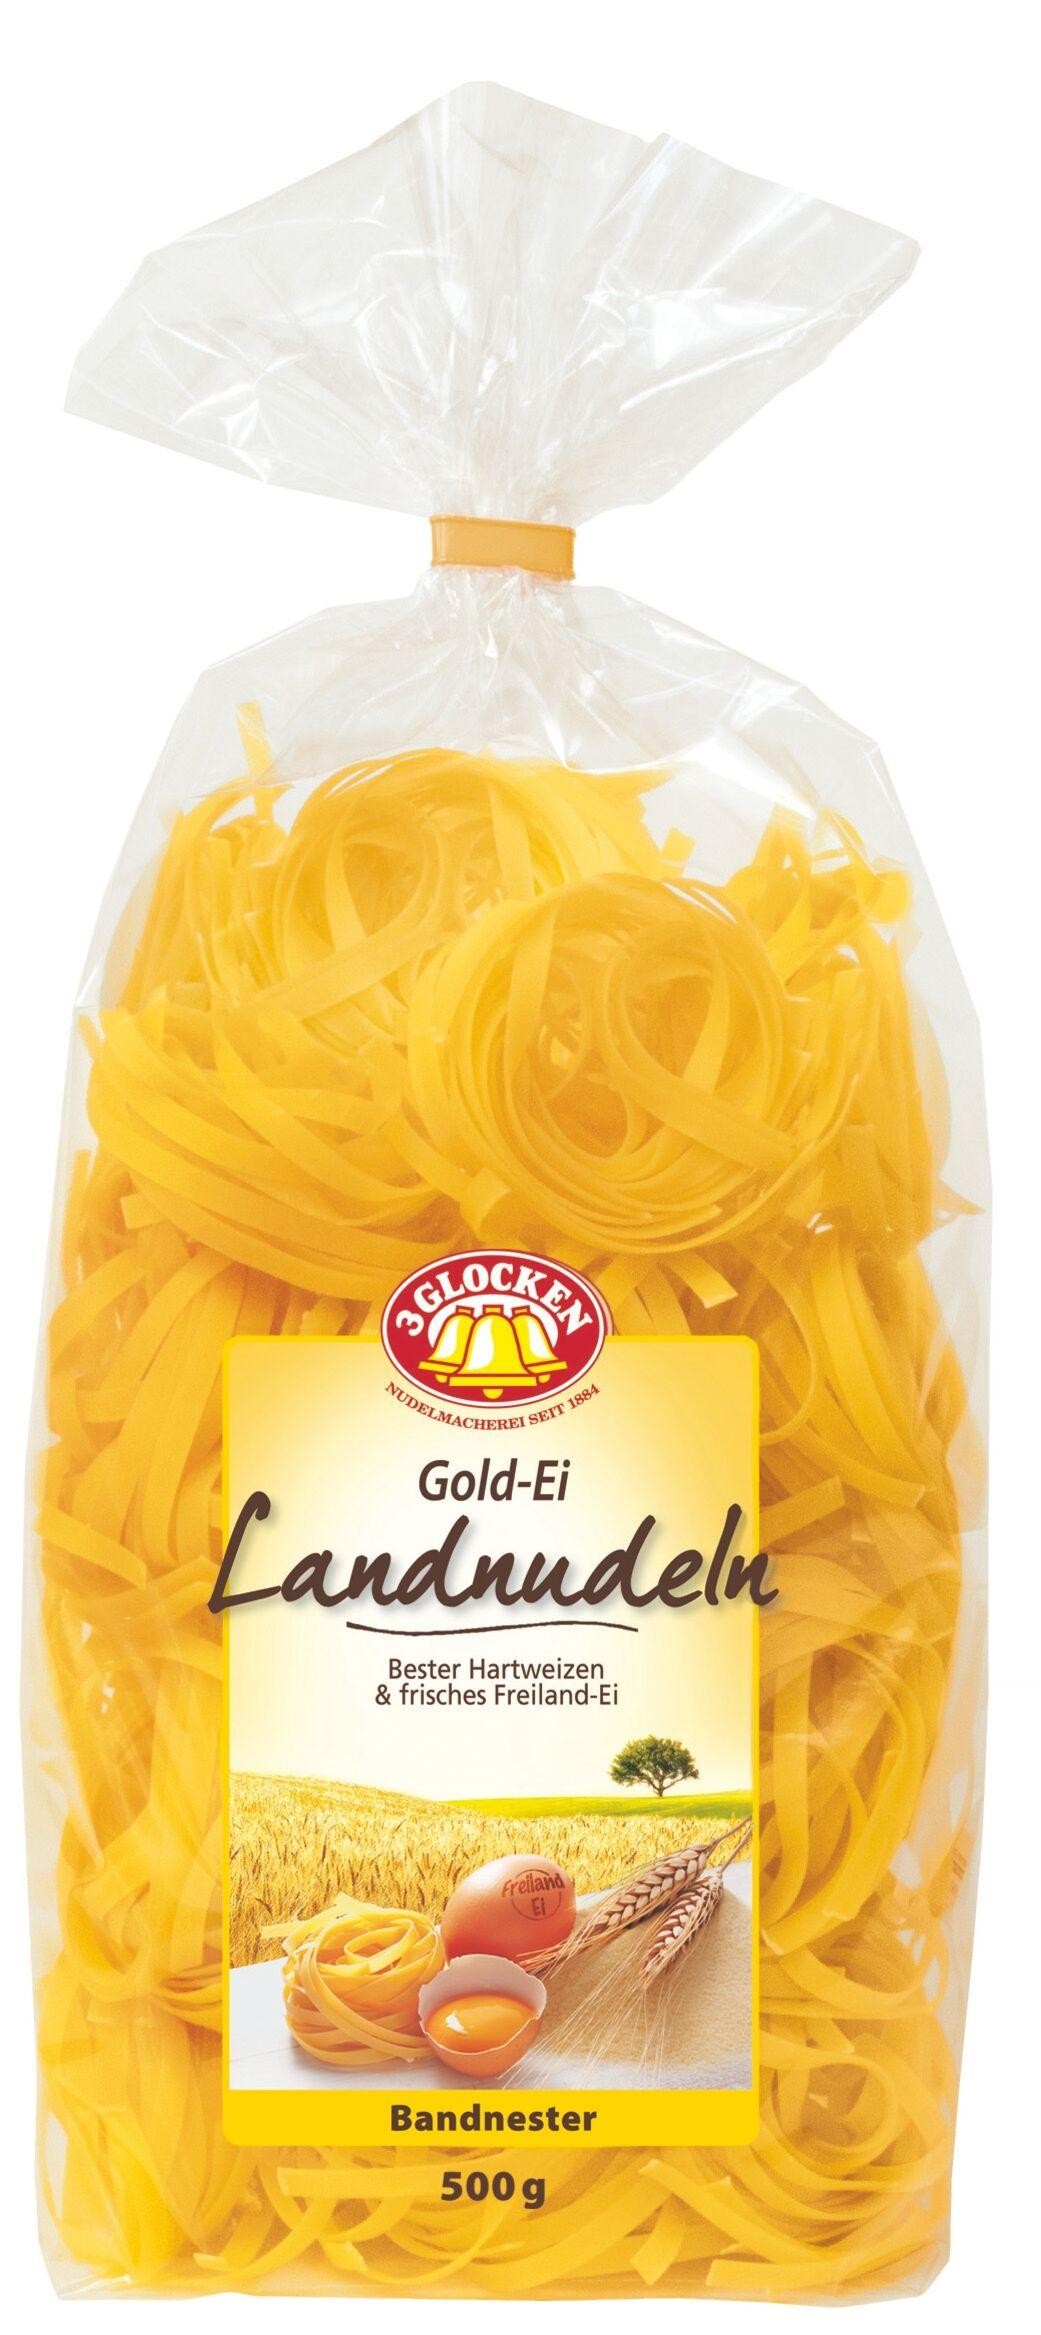 Макаронные изделия 3 Glocken Gold-ei Landnudelen Bandnester